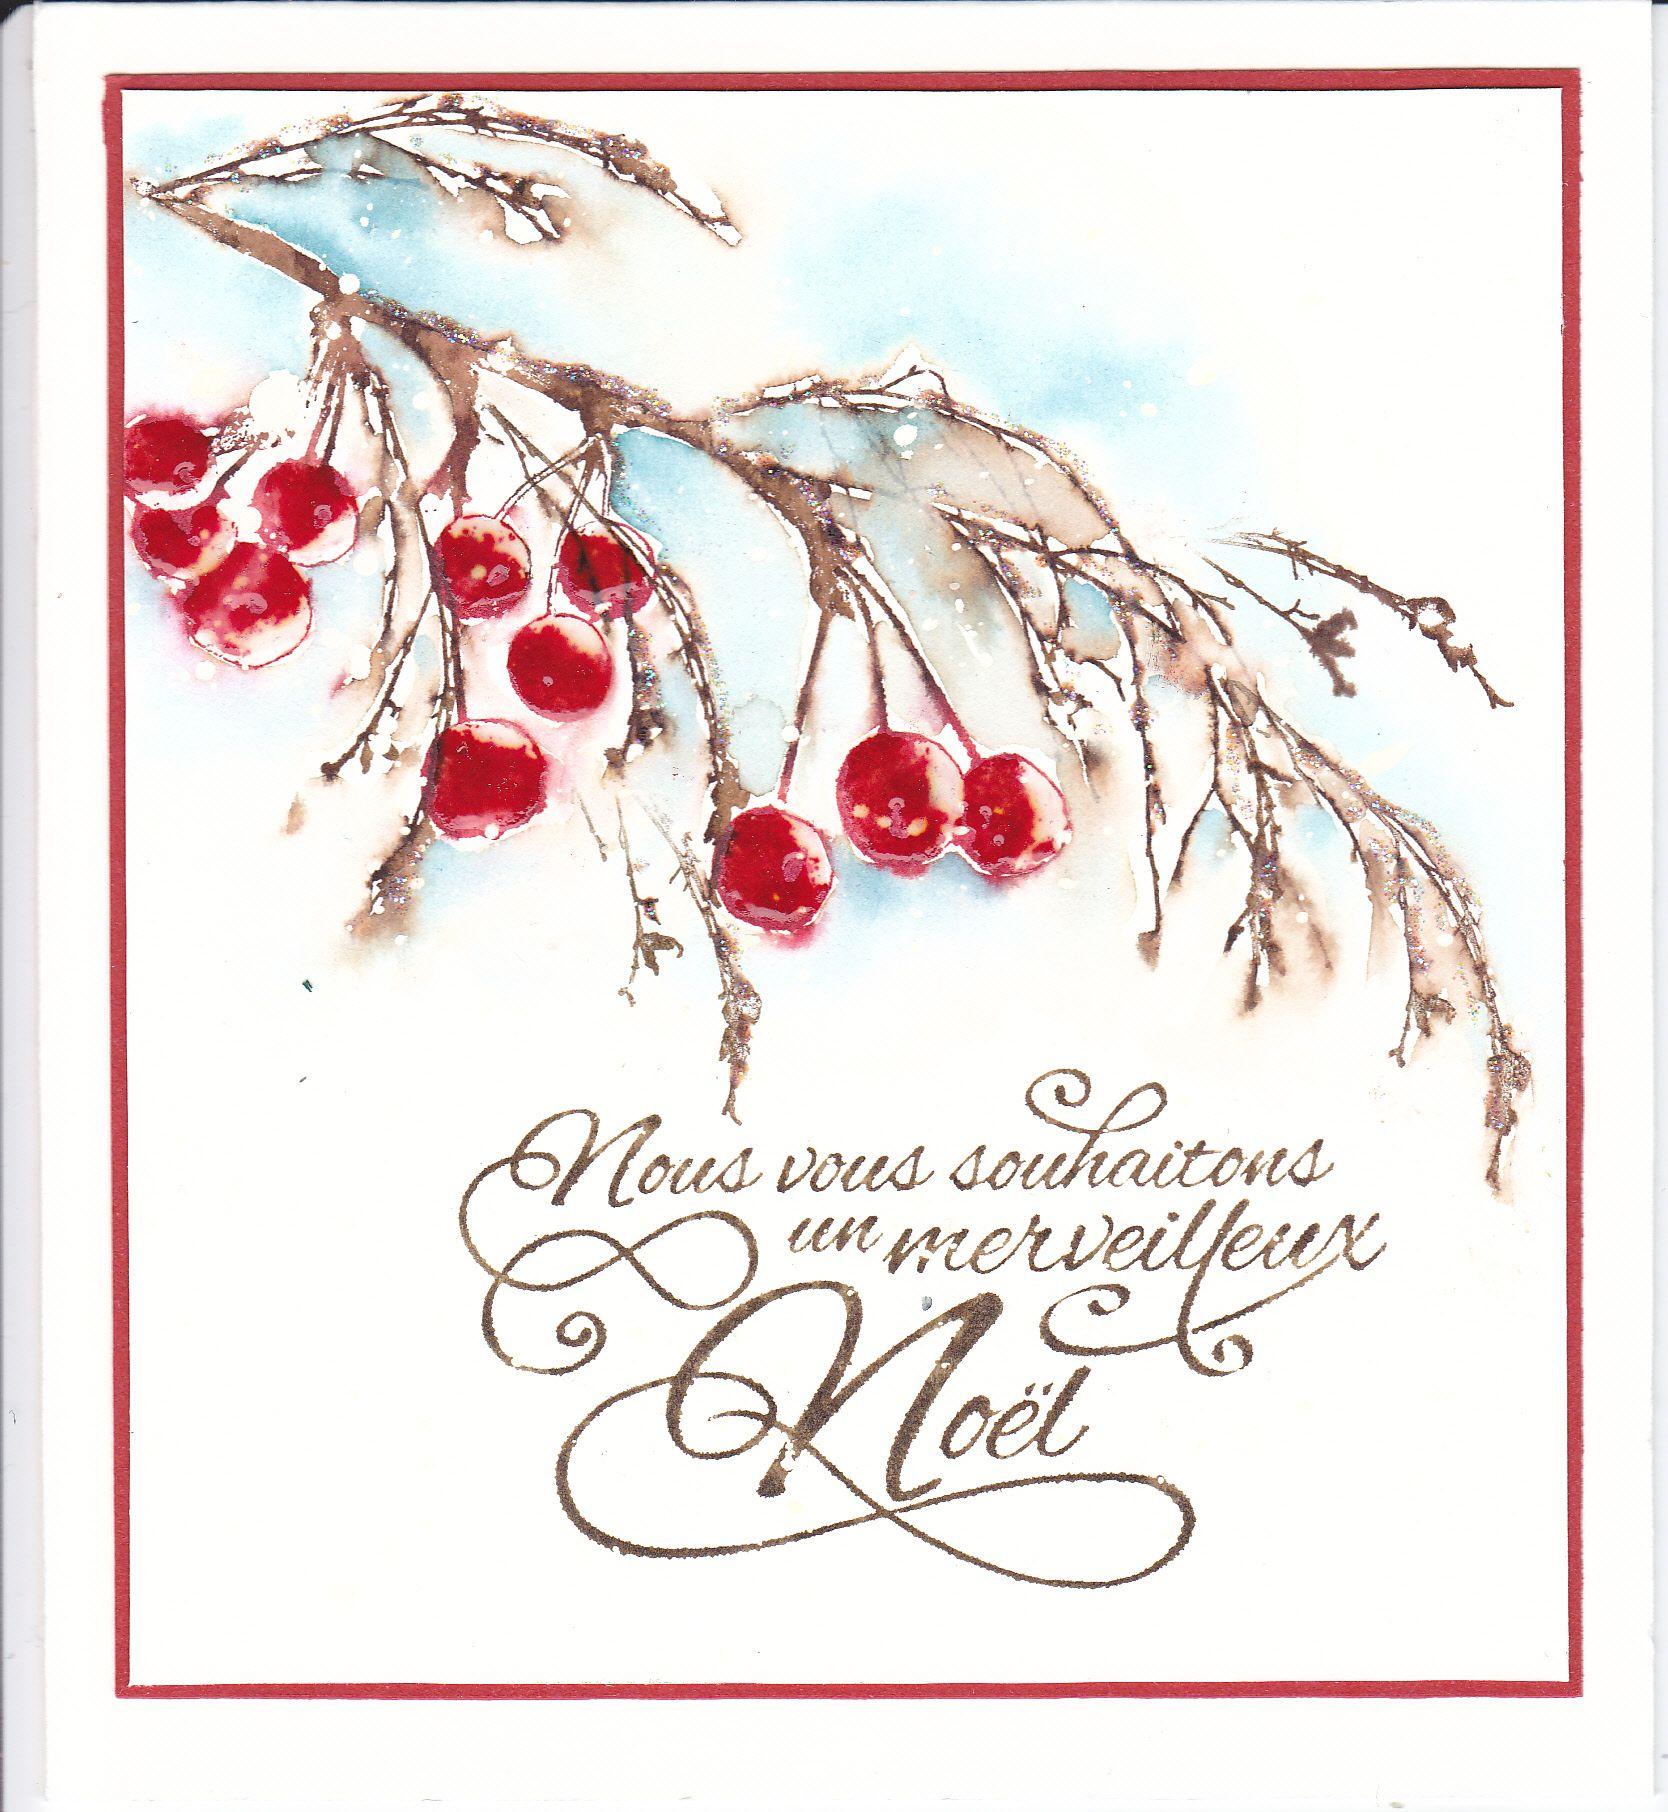 Baies De Noel 2 Watercolor Christmas Cards Penny Black Cards